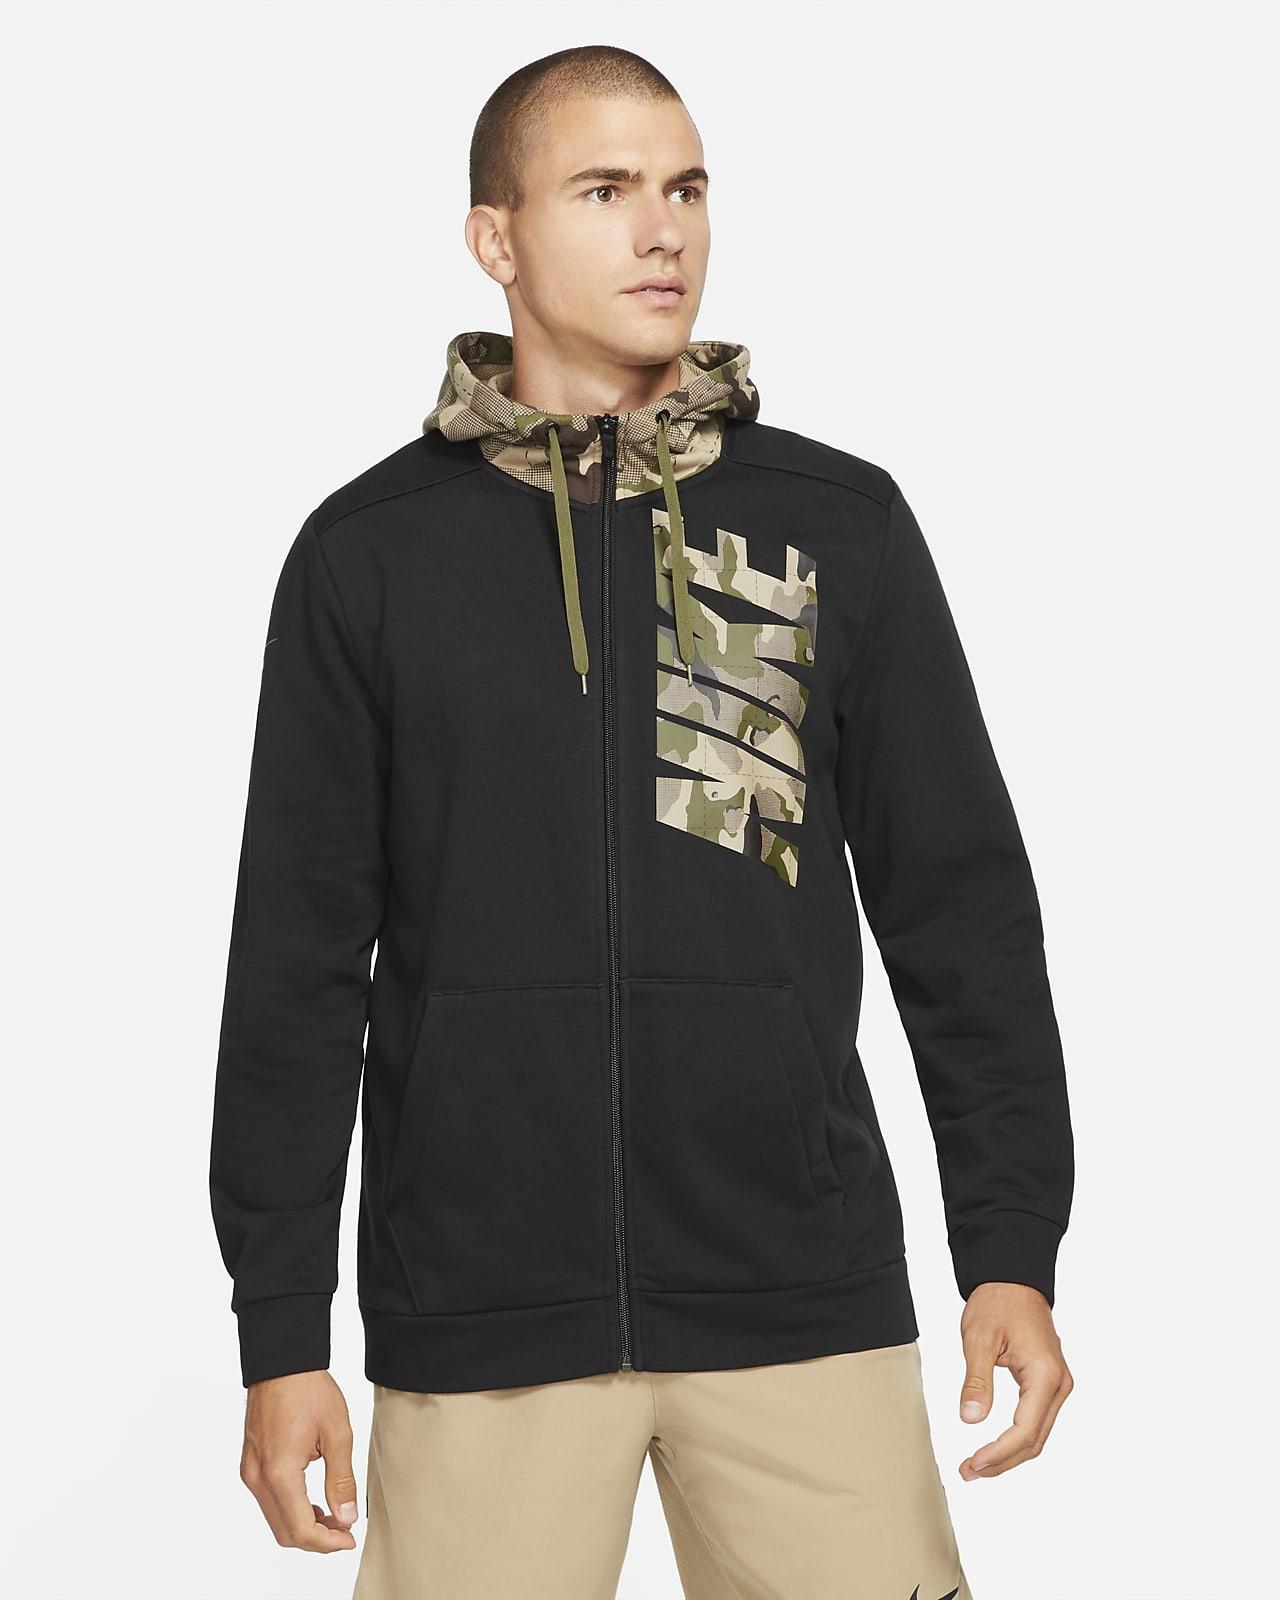 Nike Dri-FIT Men's Full-Zip Camo Training Hoodie